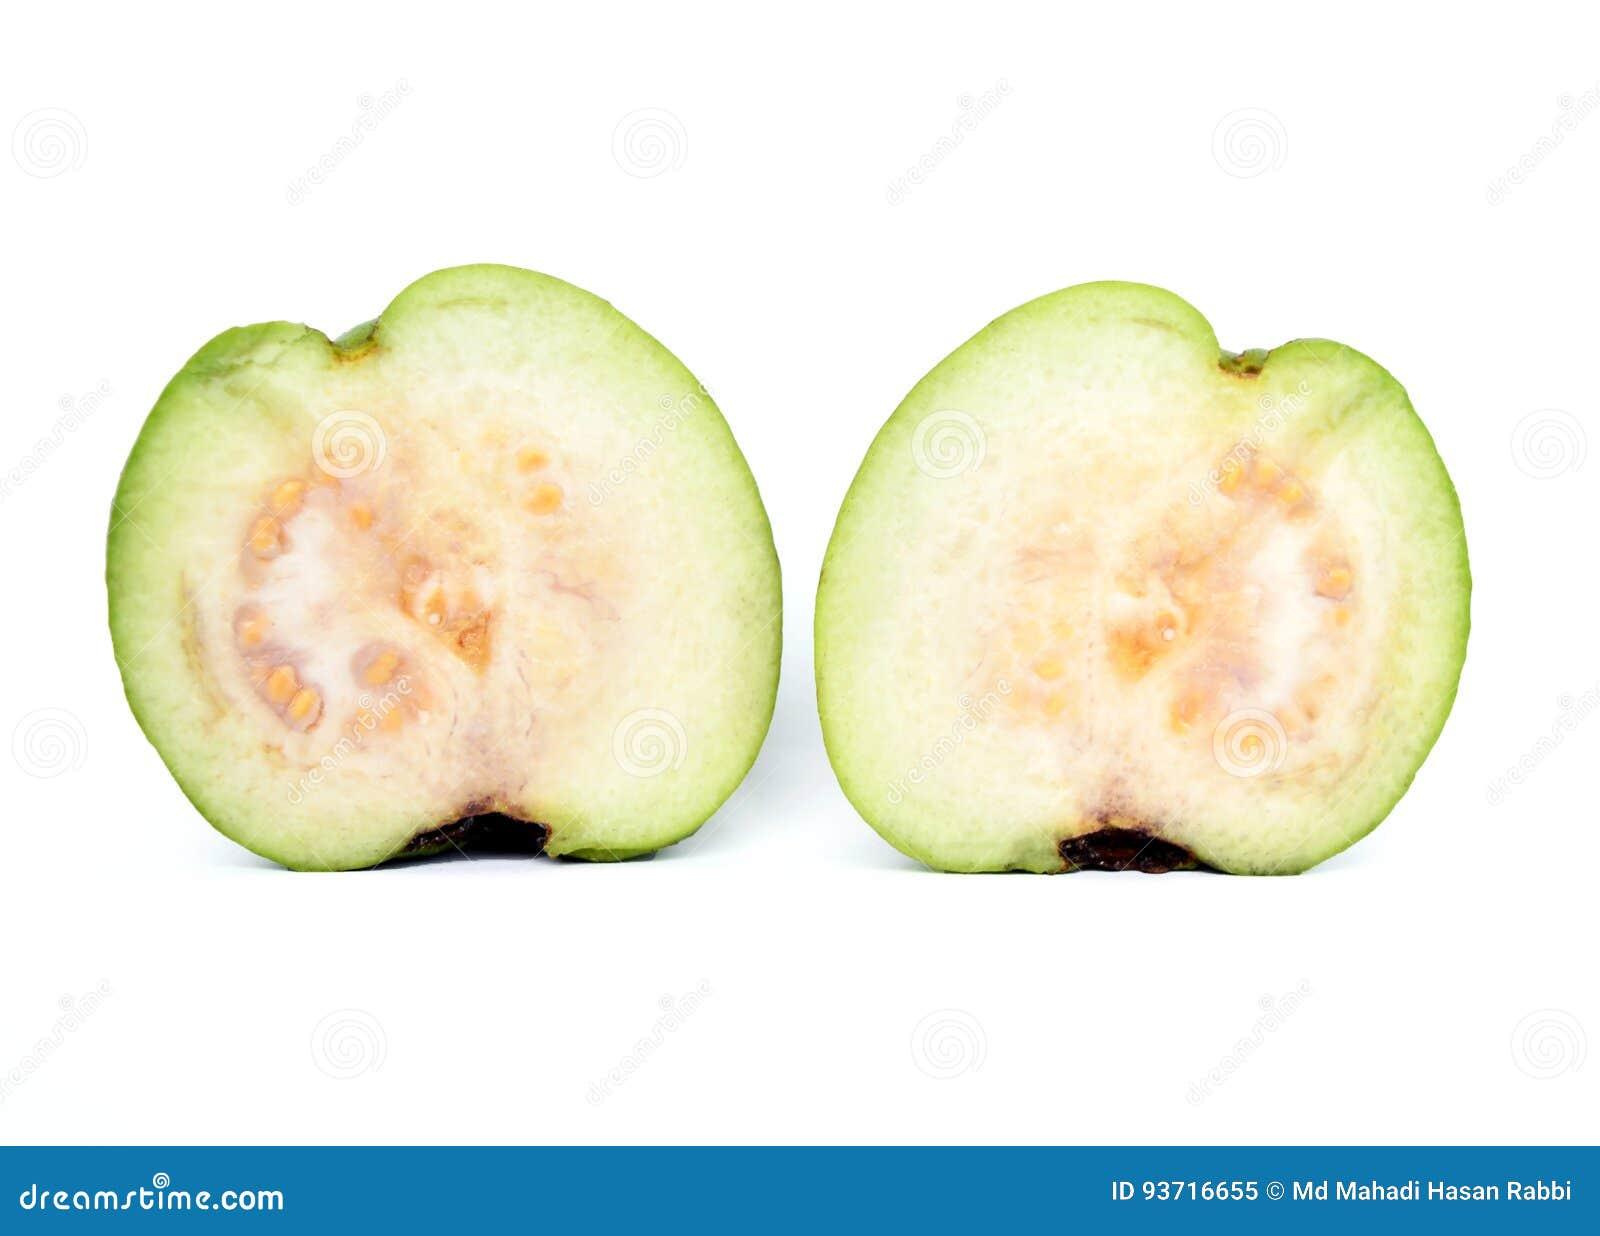 Guavepsidium guajava